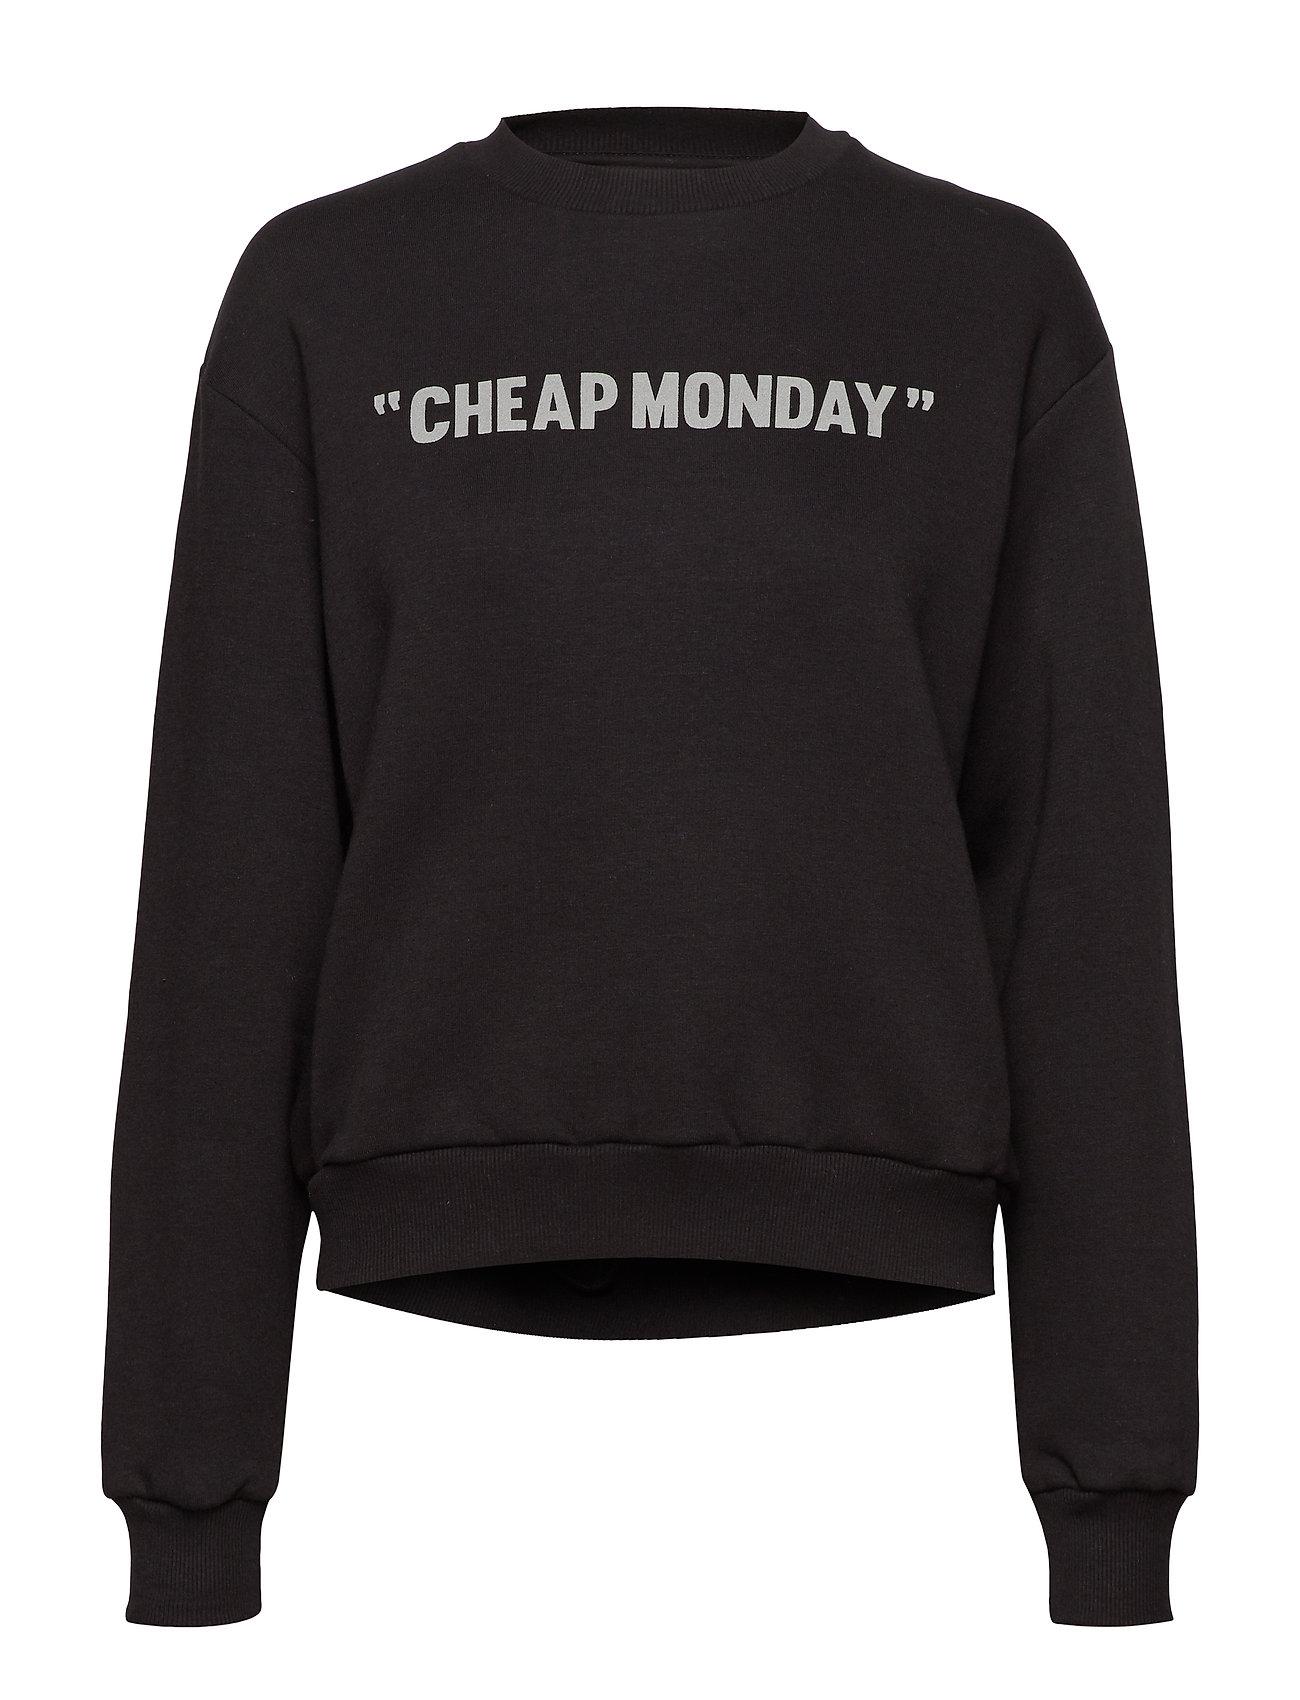 Cheap Monday Get sweat Cheap review